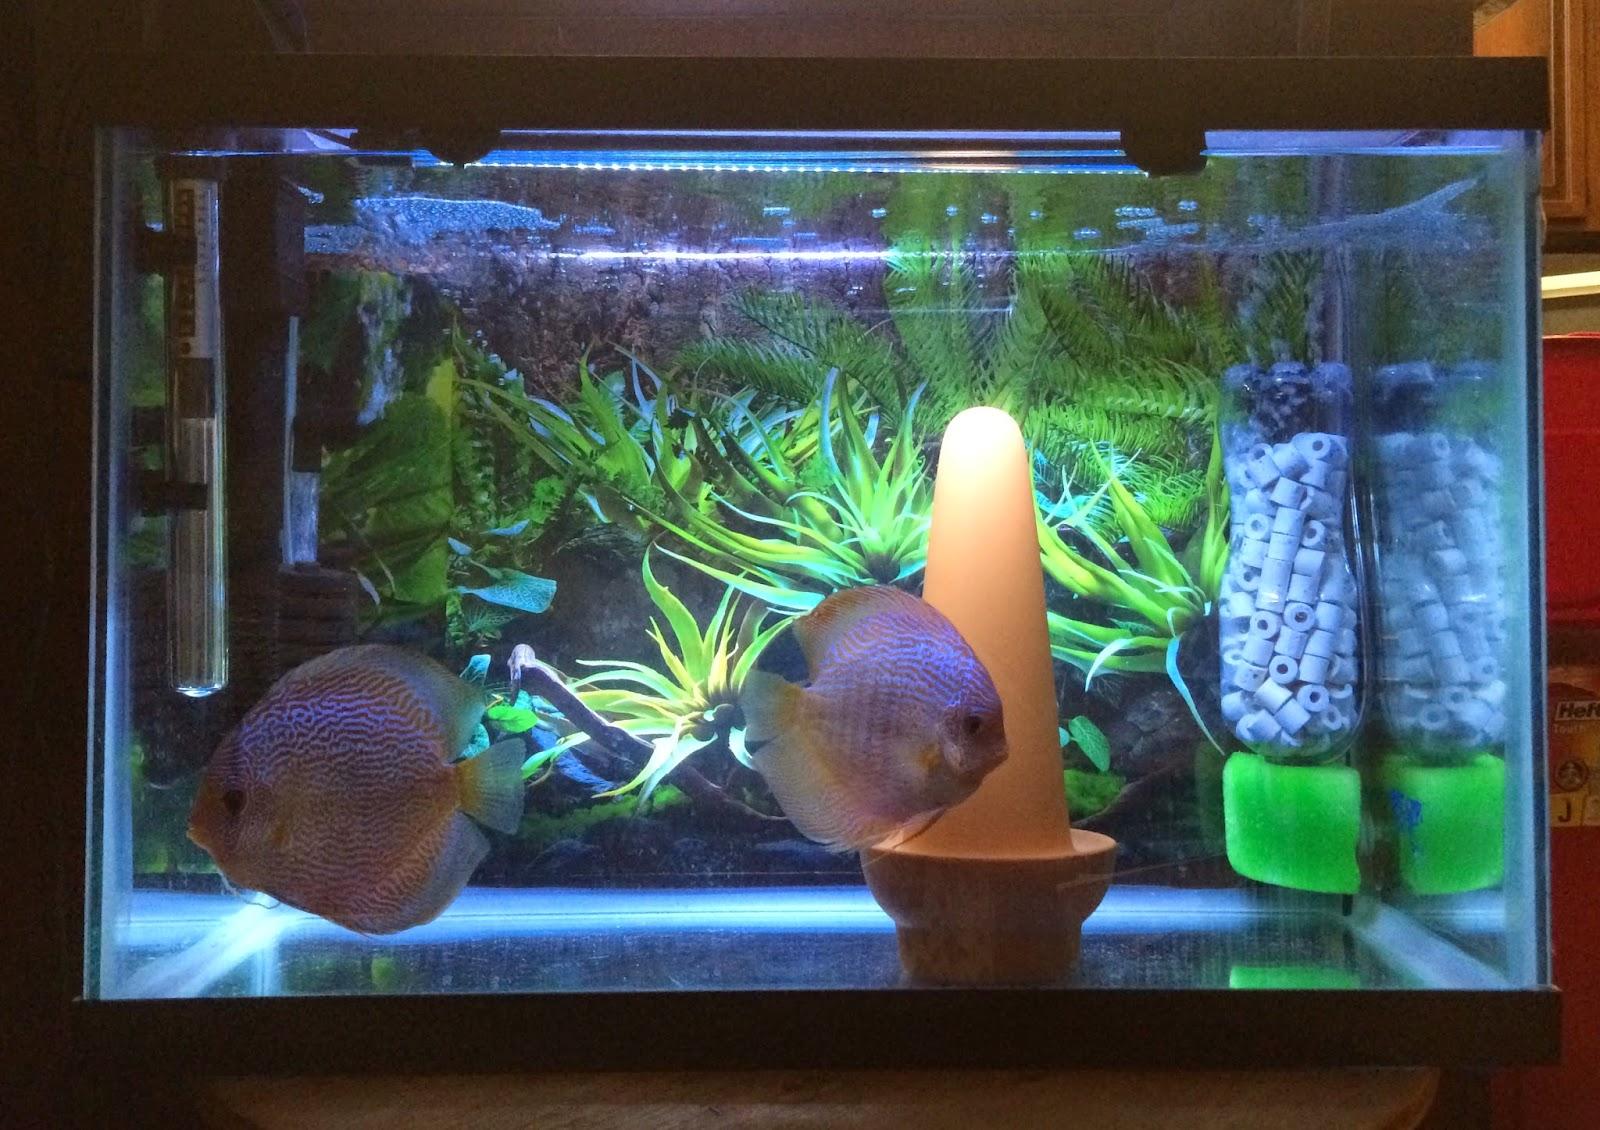 Diy filter aquarium diy free engine image for user for How to make a fish tank filter